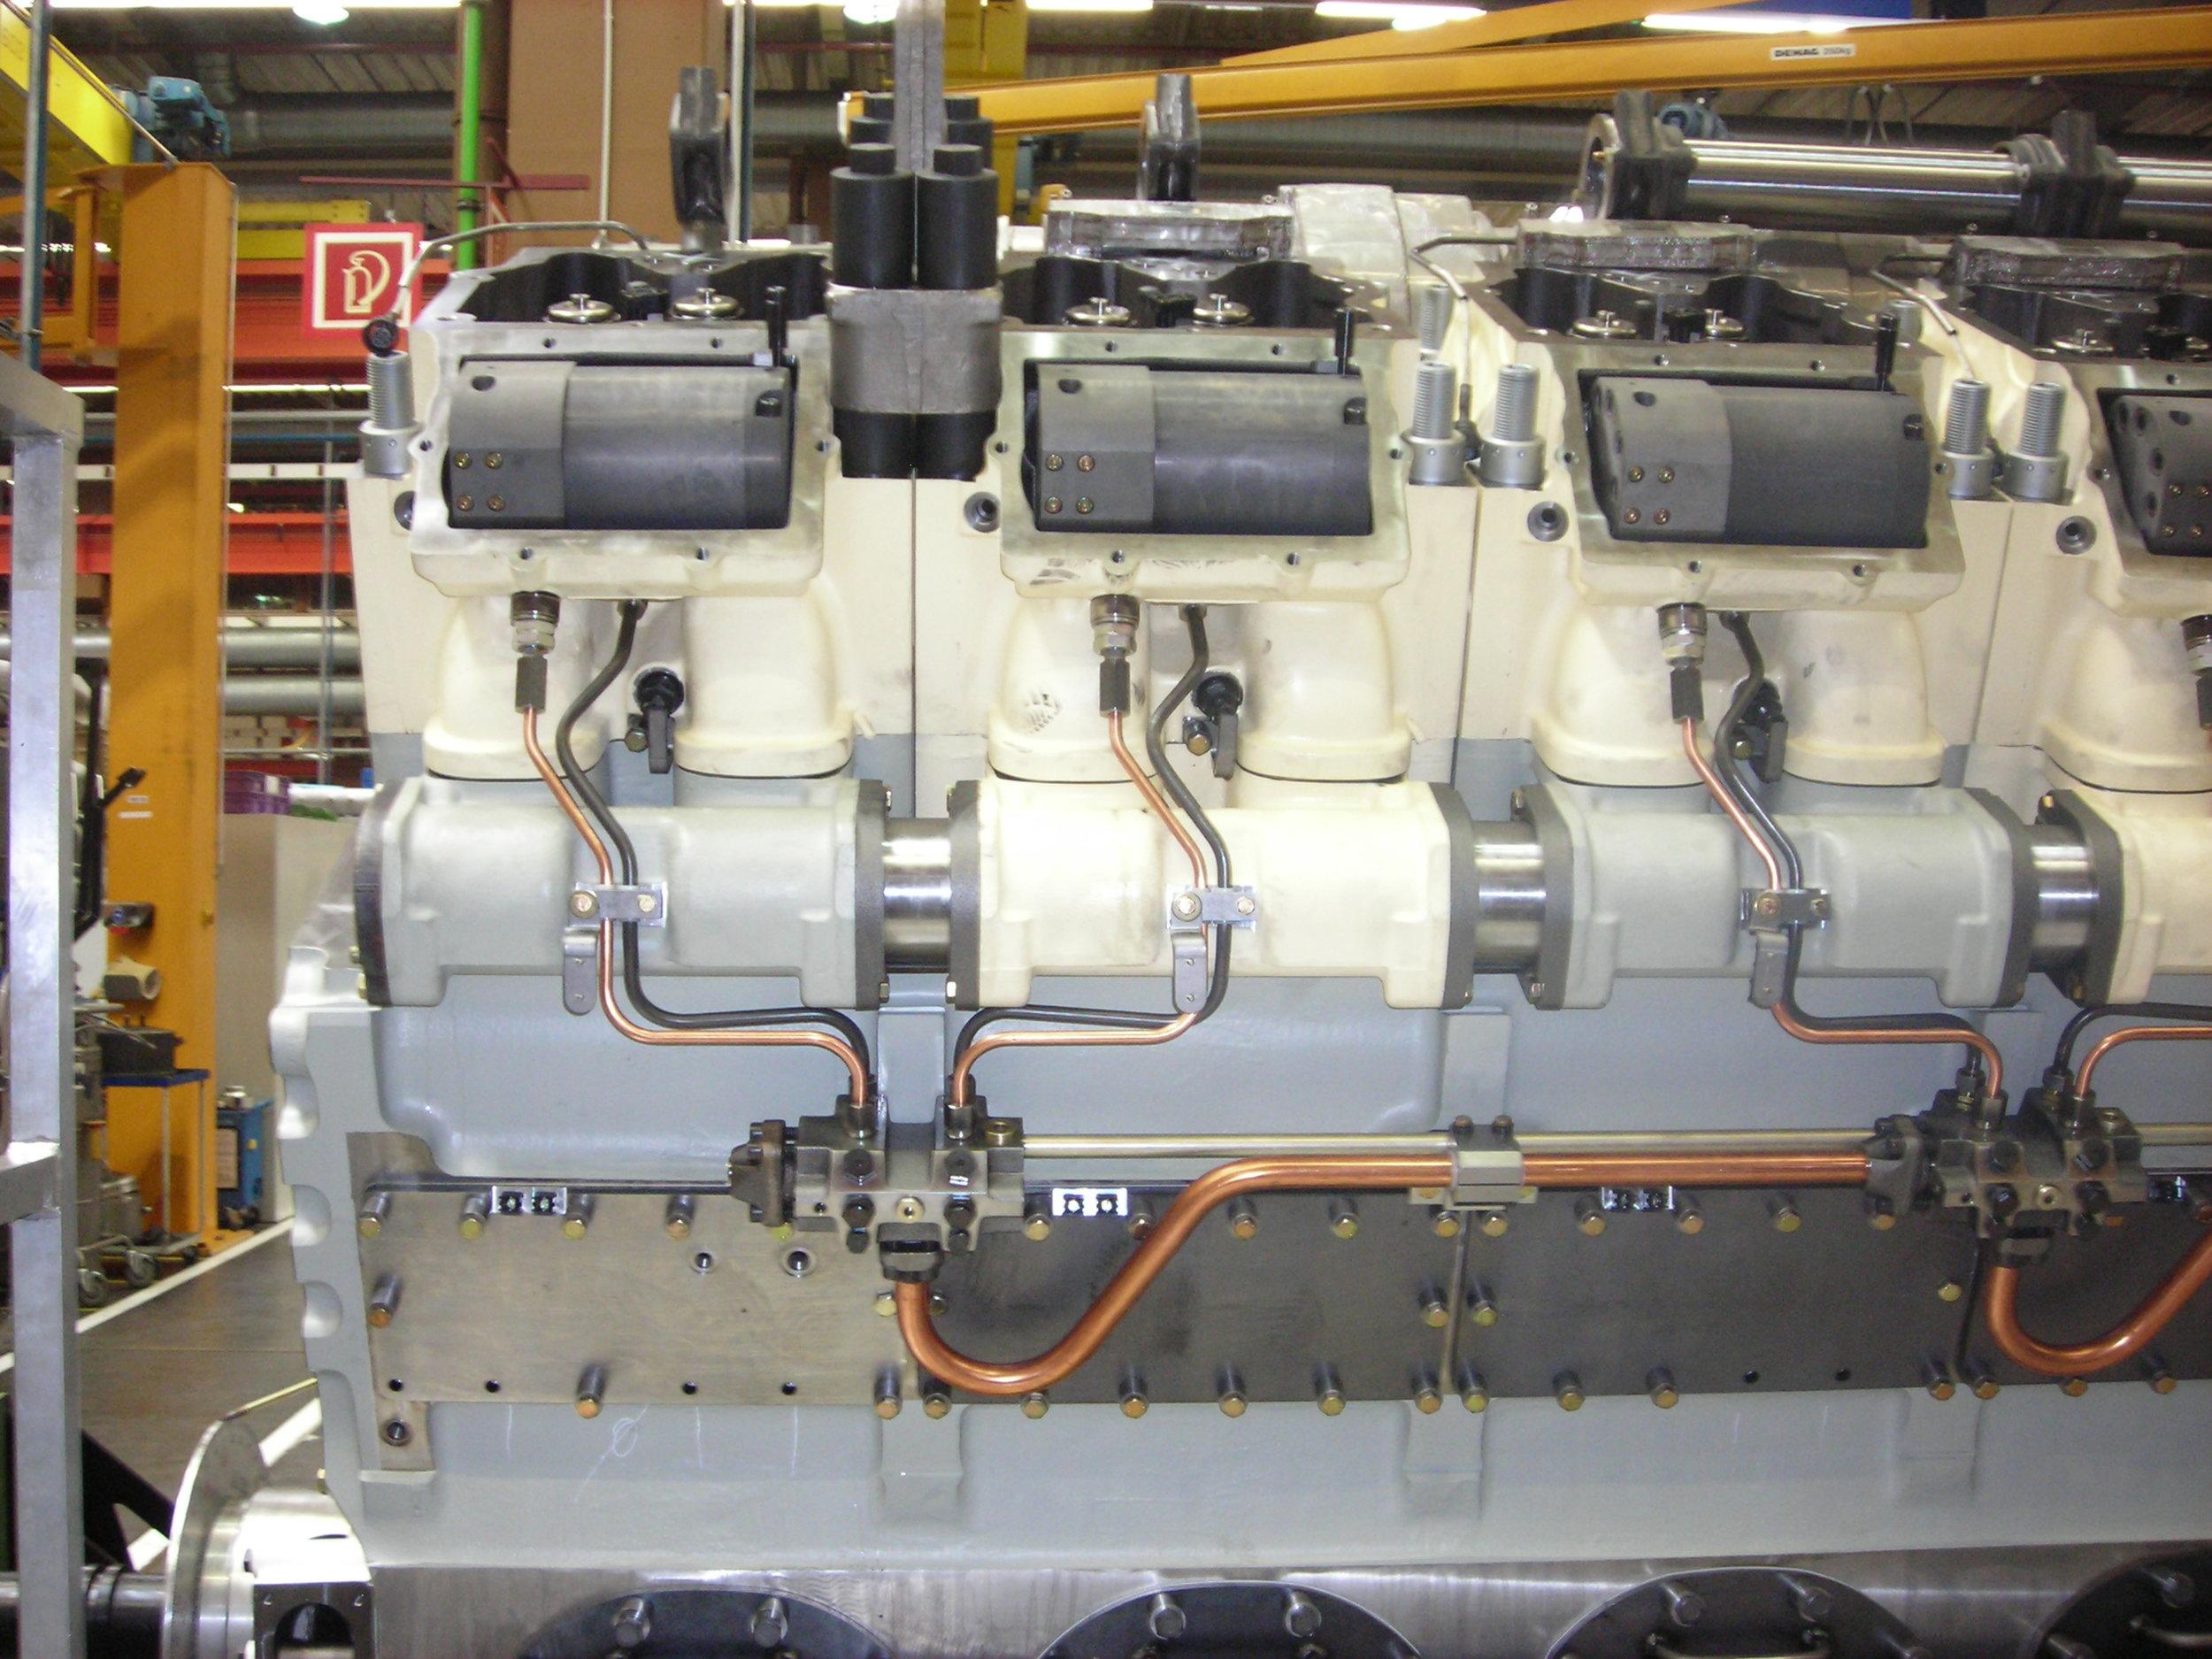 MTU series 8000 common rail injection system installation